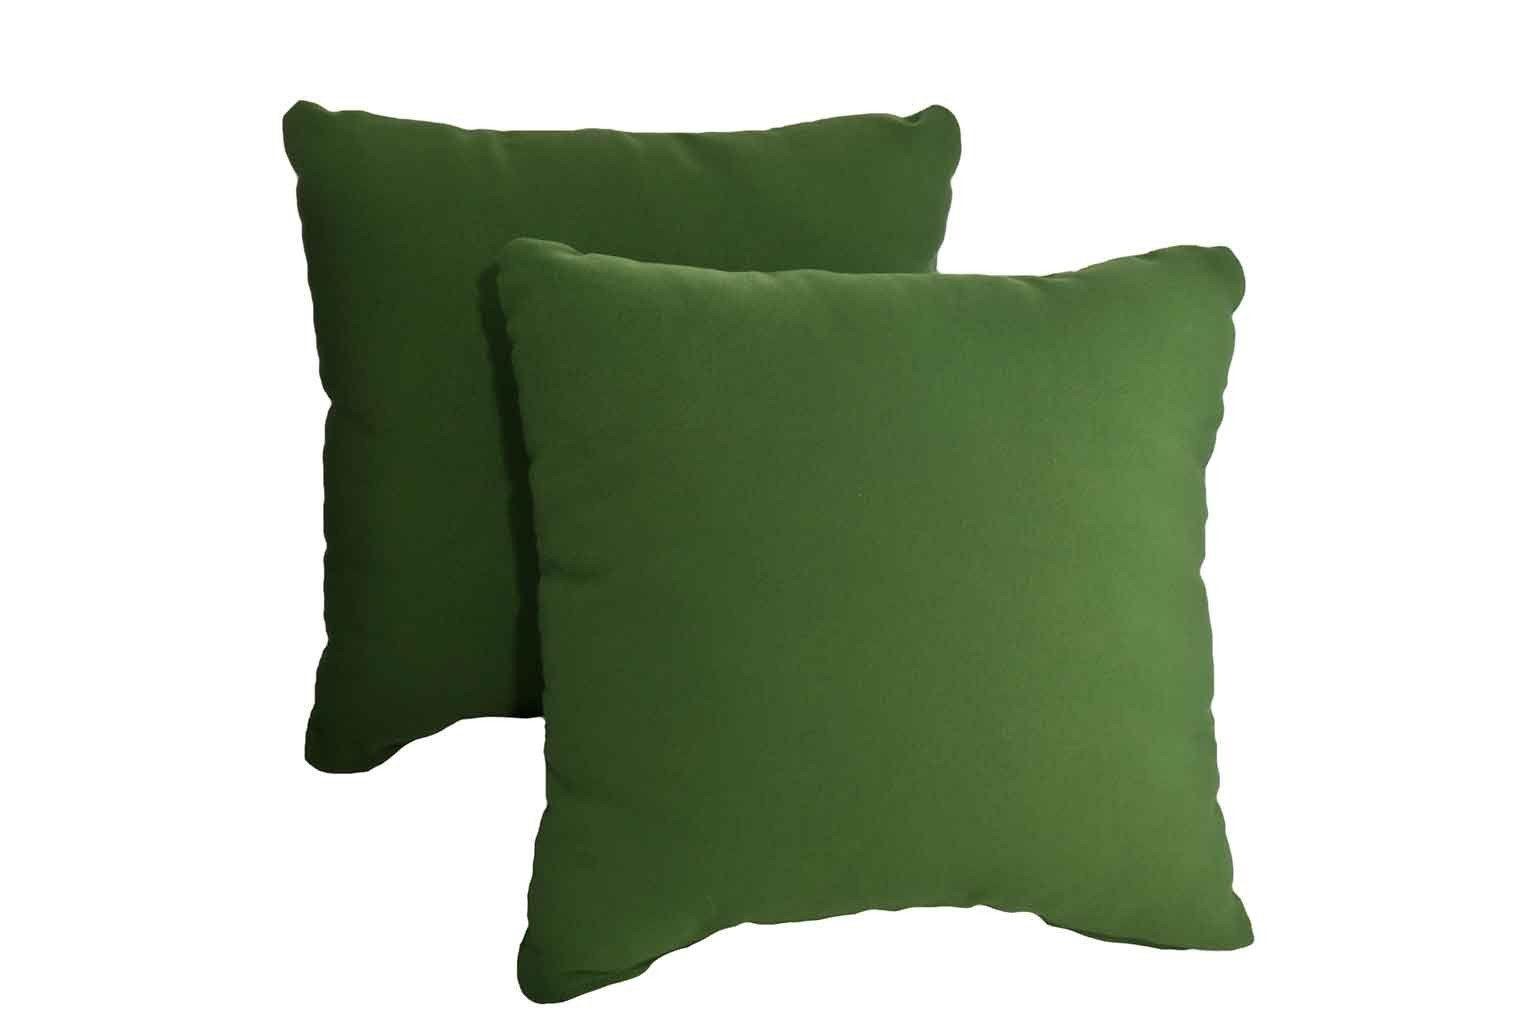 Hunter green pillows set of green pillows pillows and outdoor